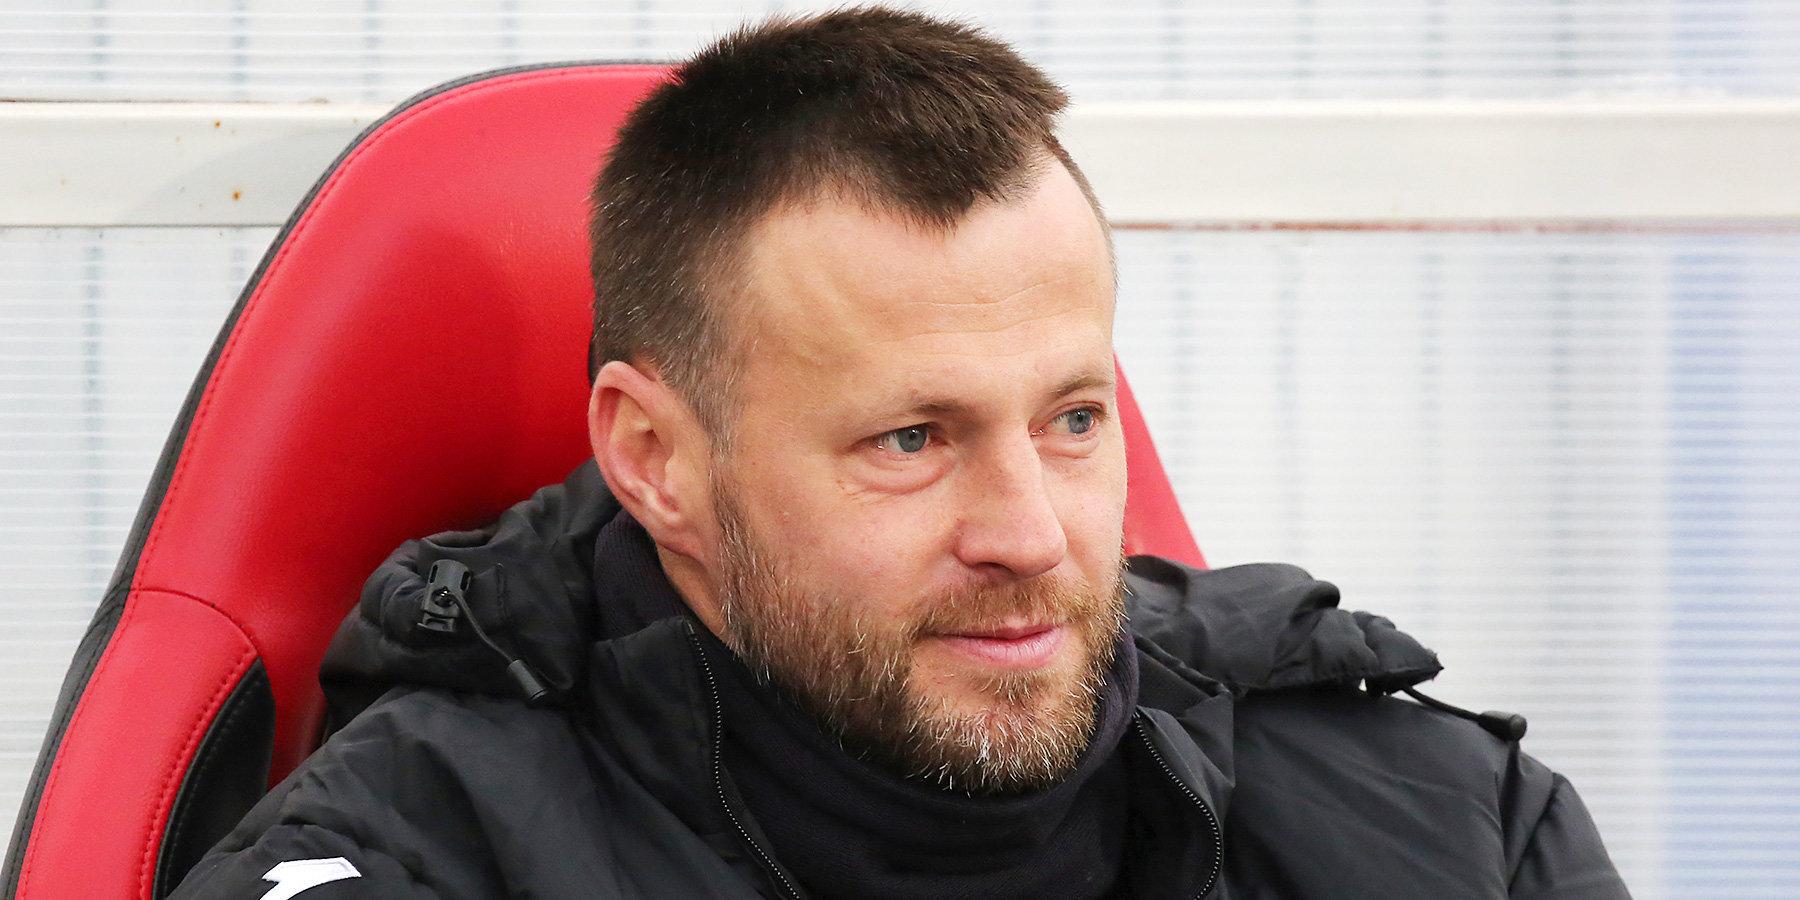 Андрей Каряка: «Динамо» нужен такой авторитет, как Семин или Бердыев»